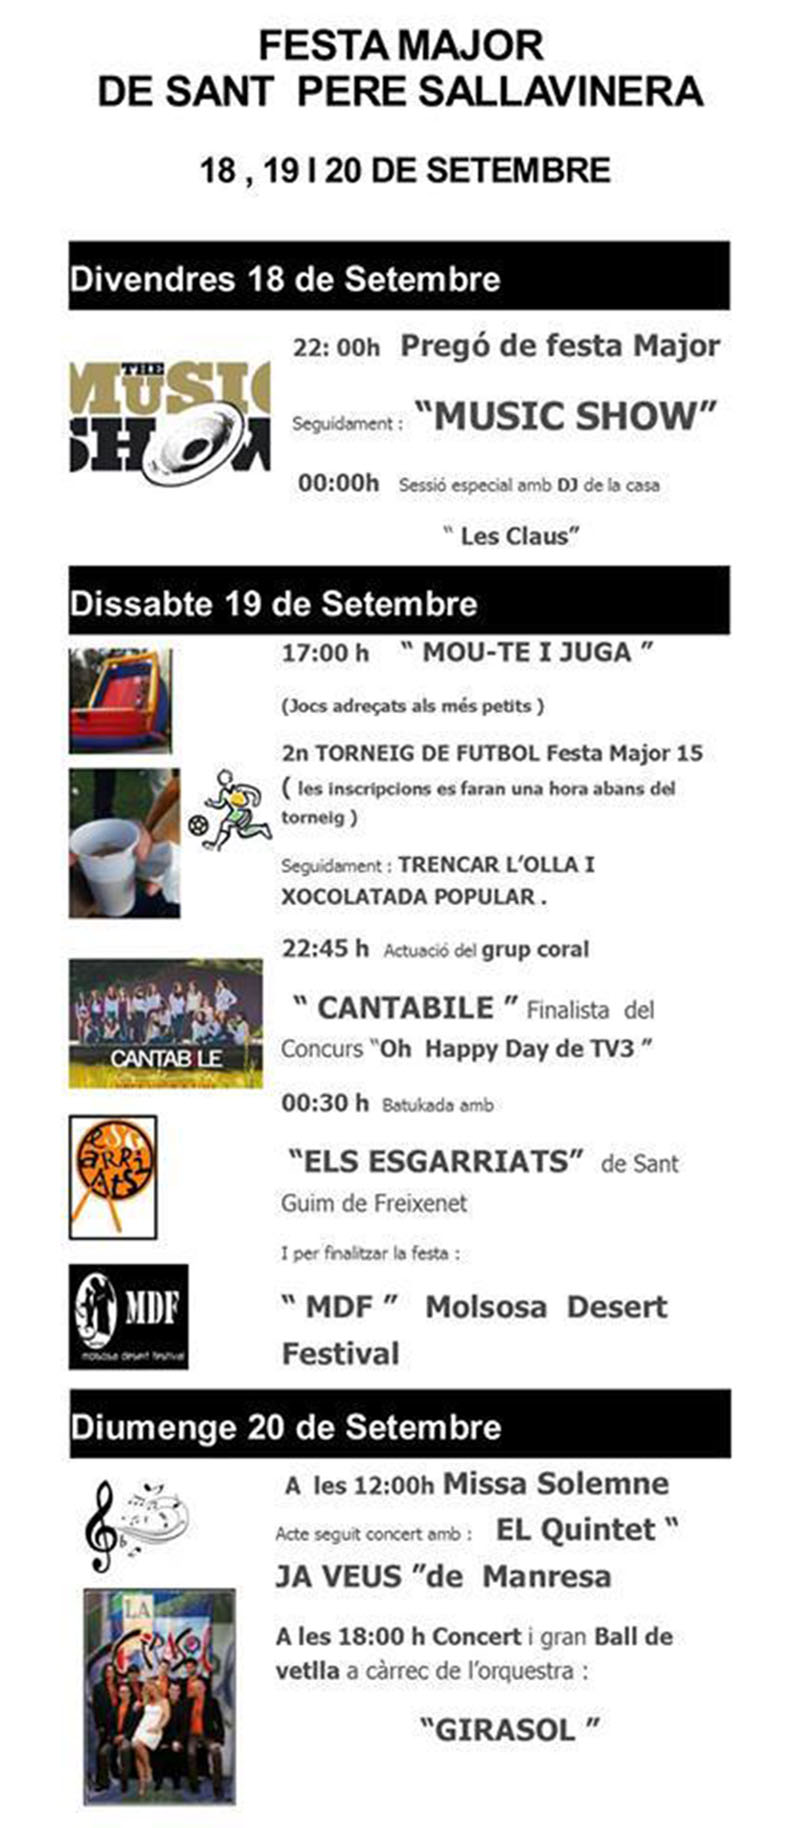 cartell Festa Major de Sant Pere Sallavinera 2015